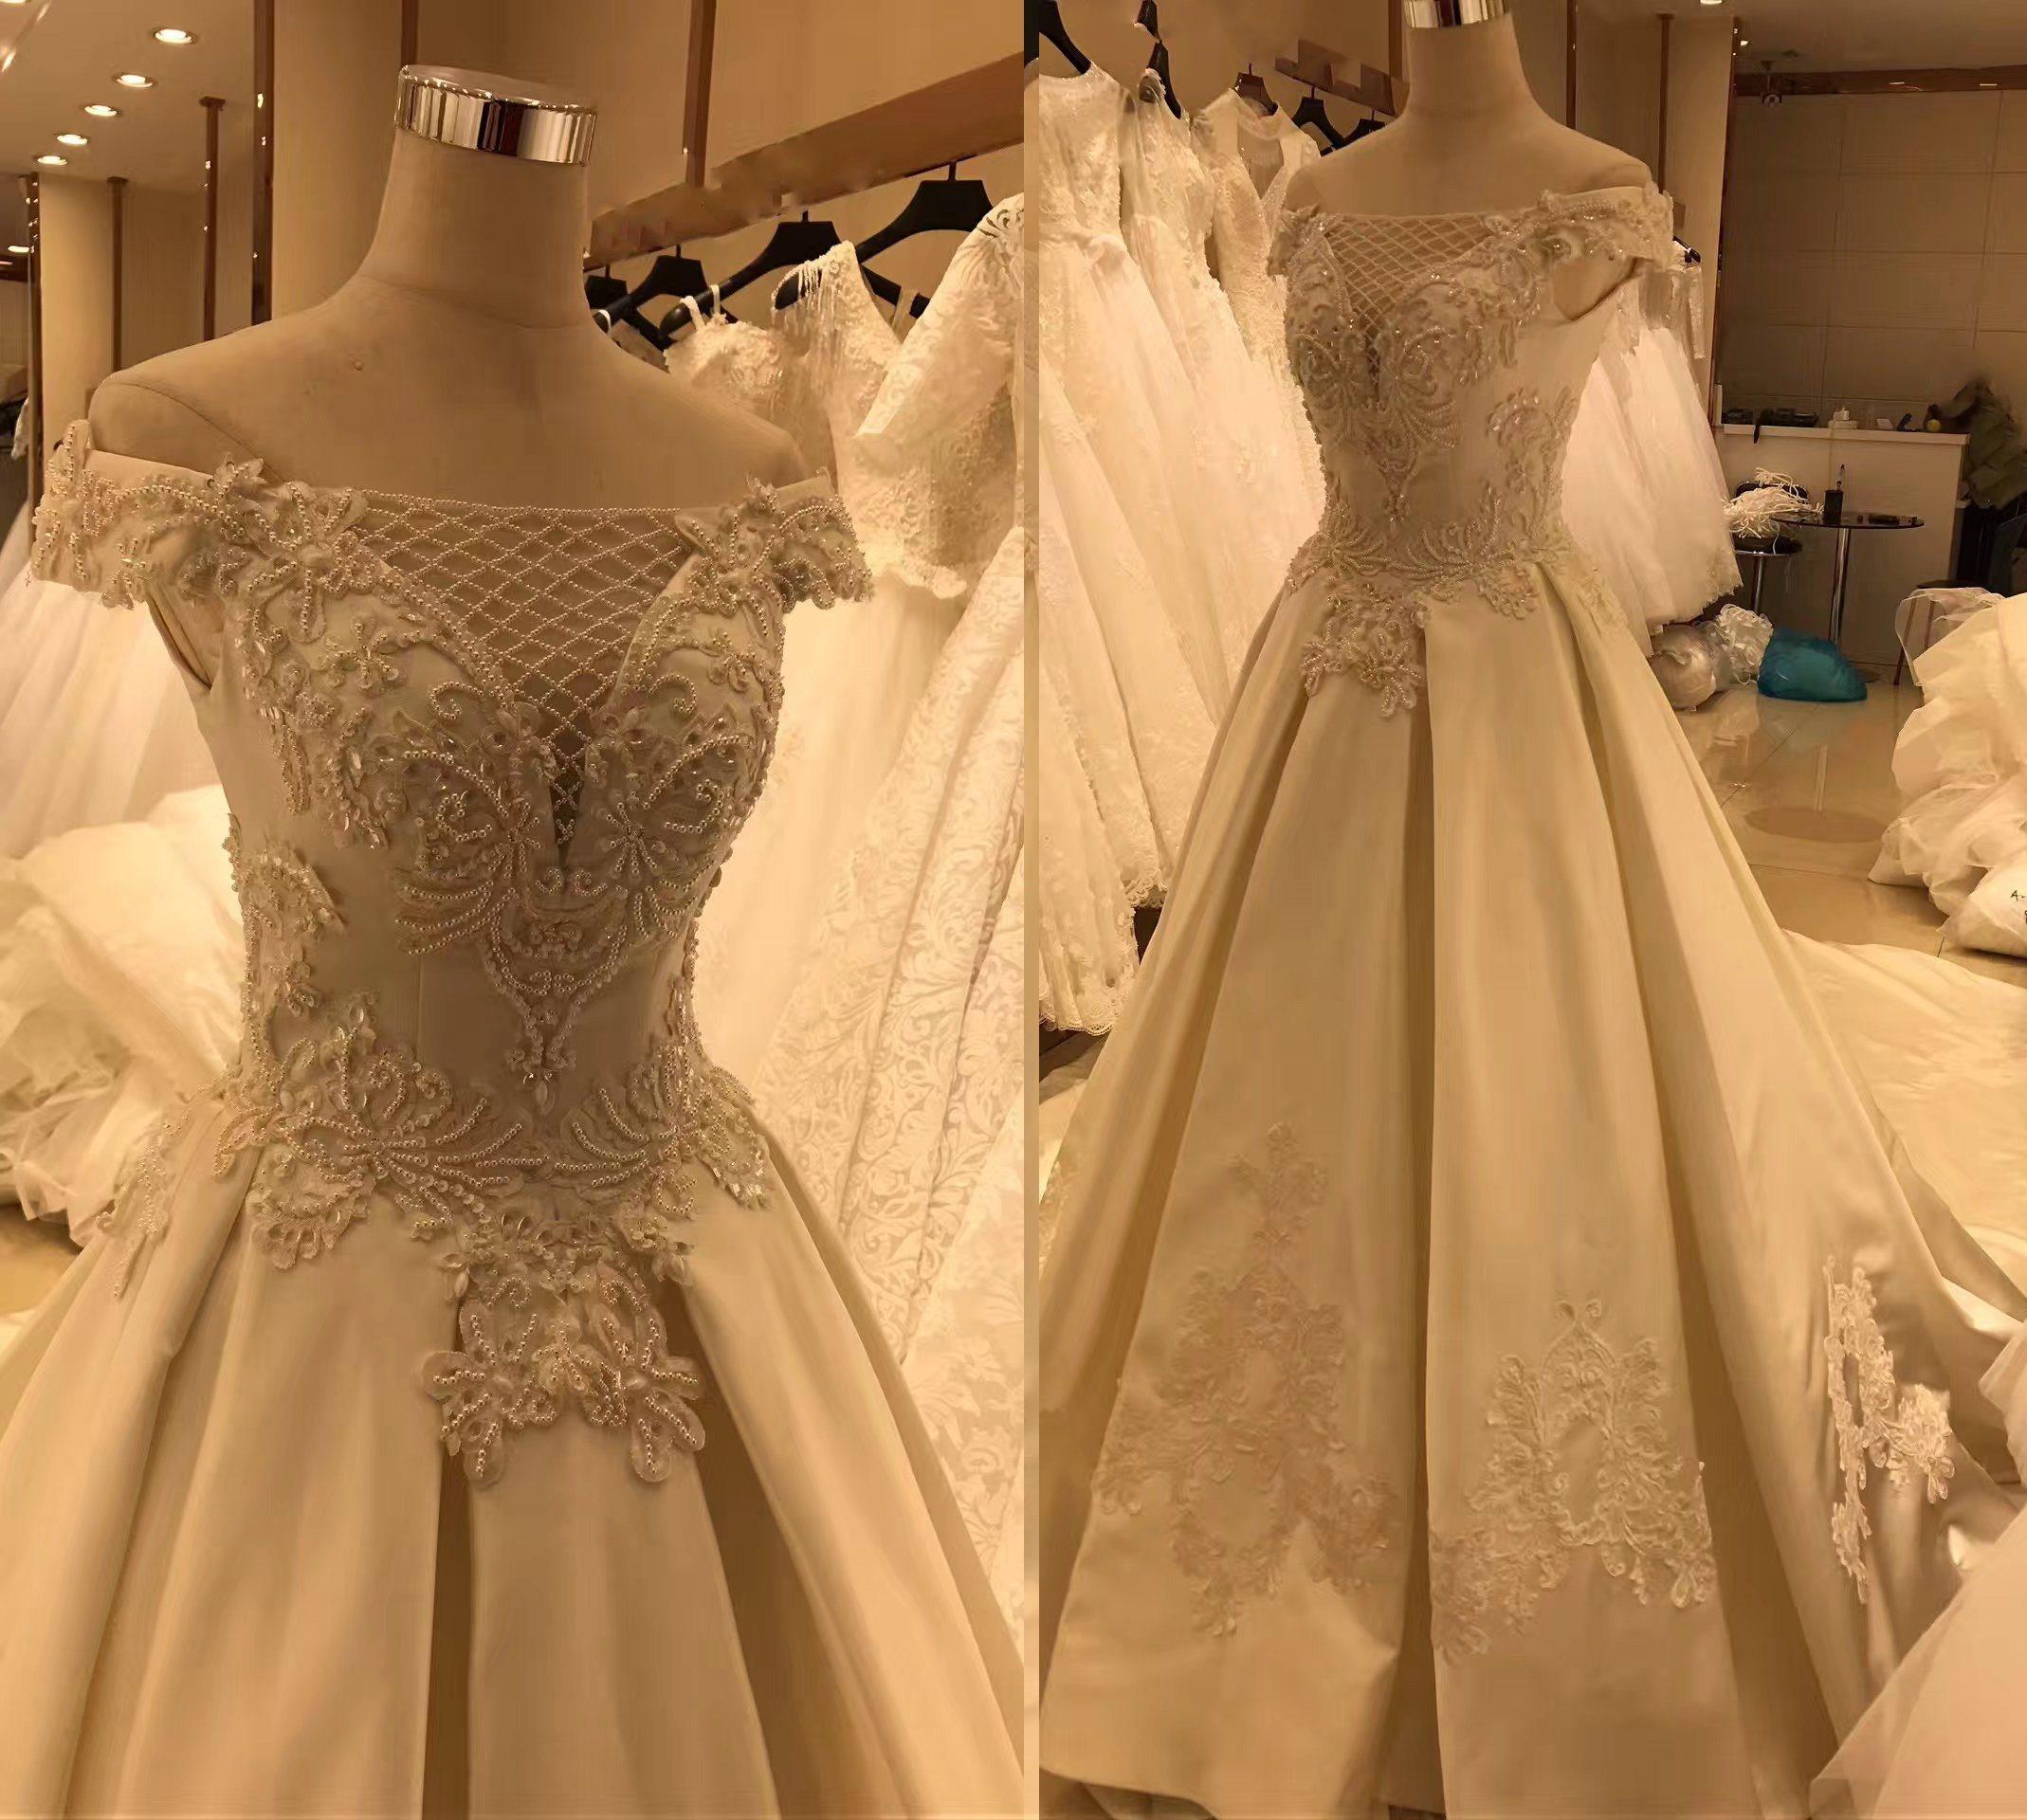 Satin Real Sample Wedding Dress Gown